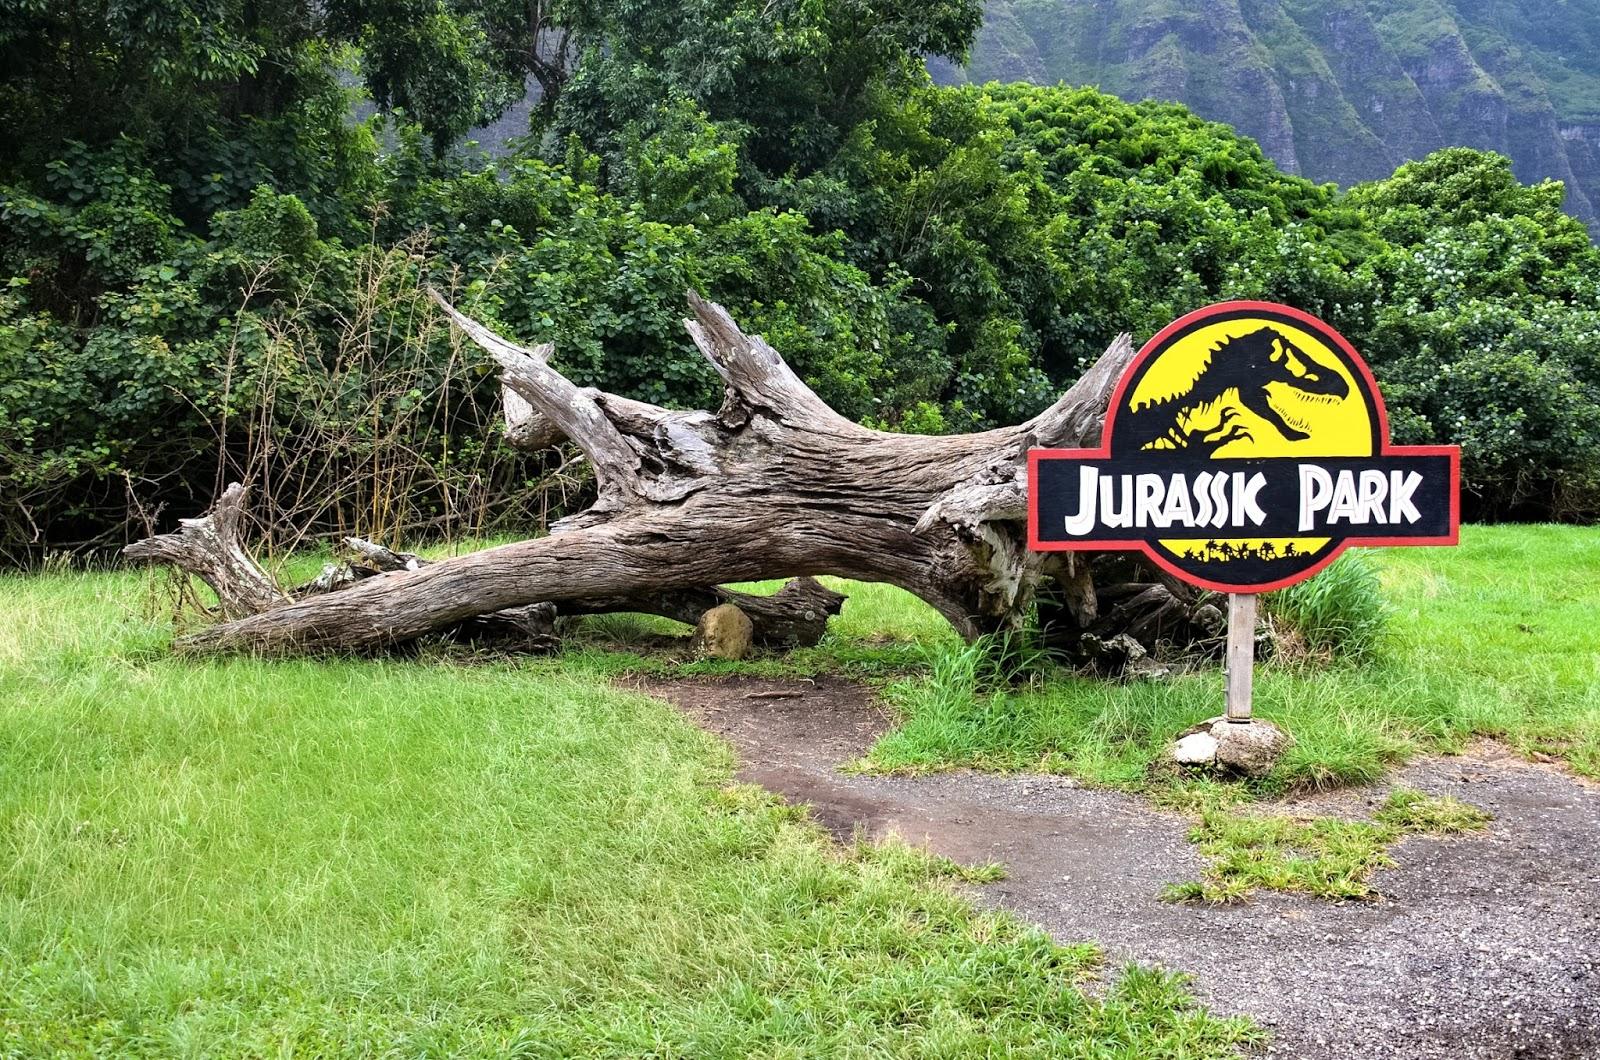 jurrasic park kualoa ranch